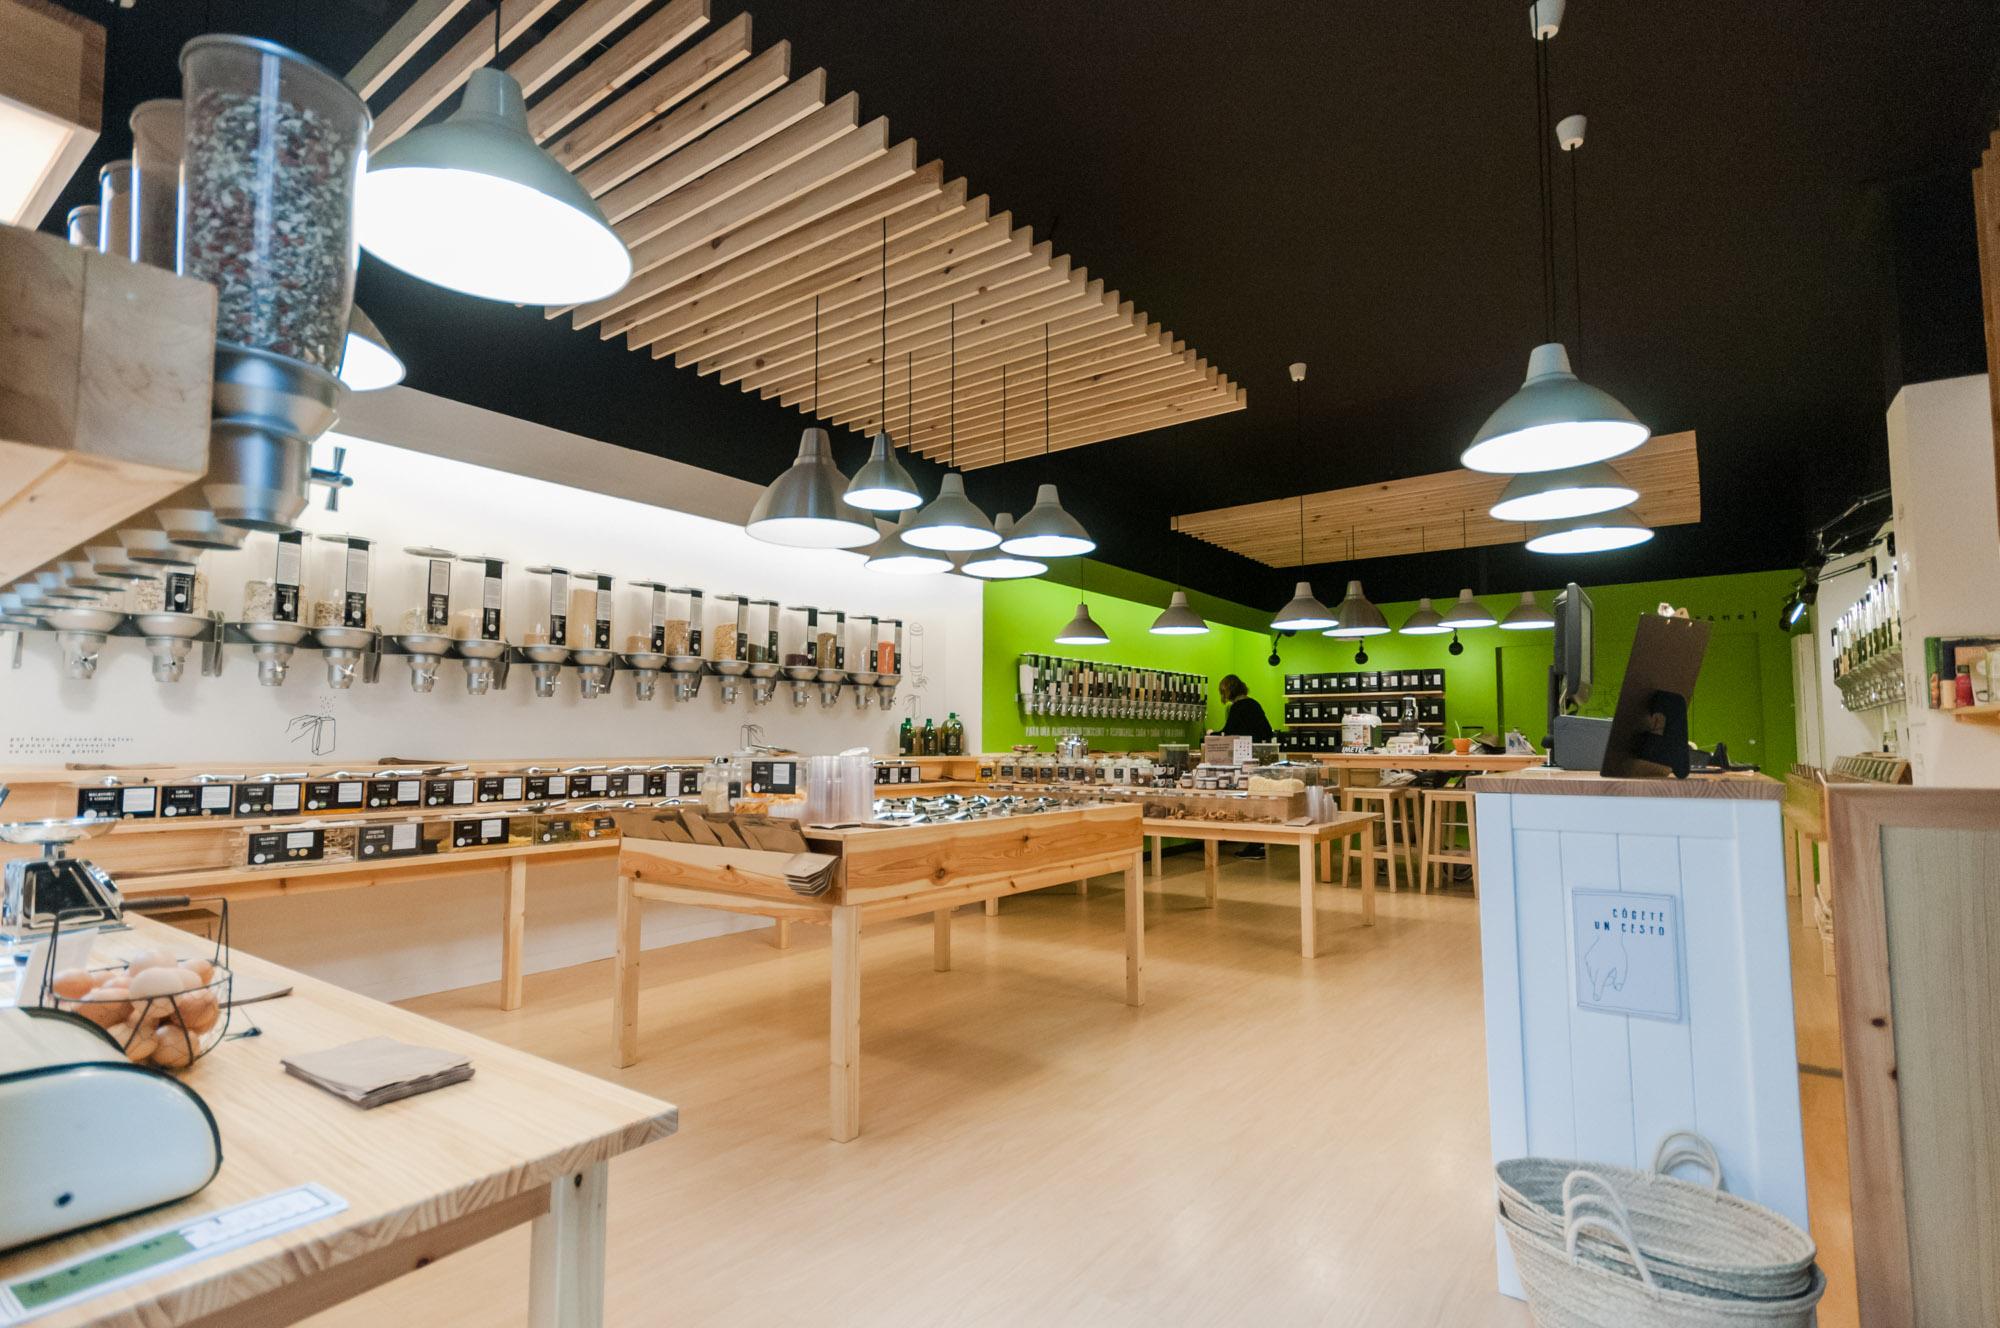 Muebles gijon asturias obtenga ideas dise o de muebles for Muebles de oficina gijon